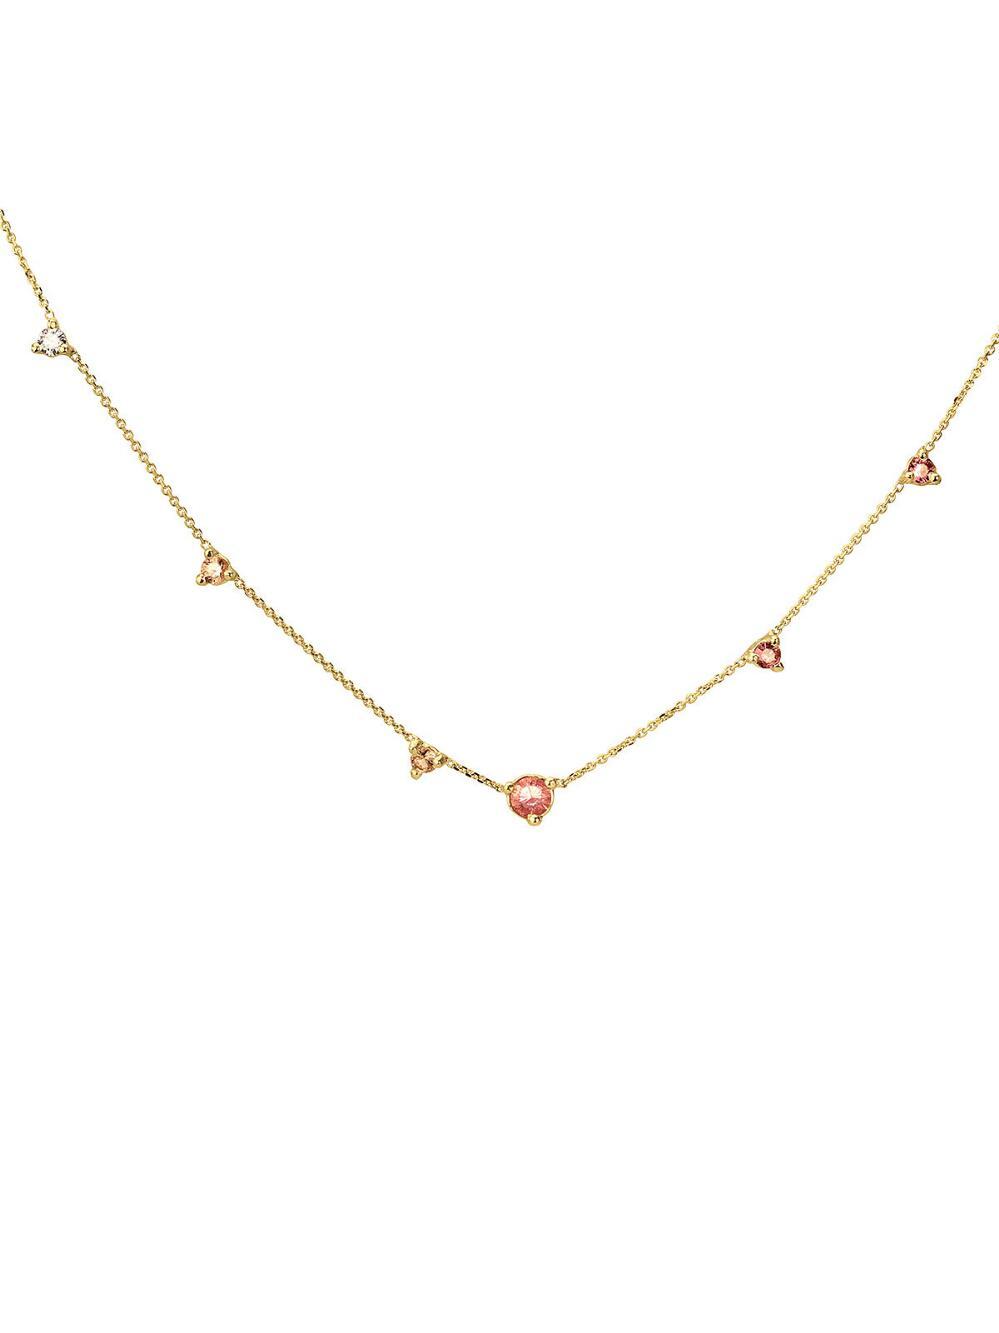 335ca0b18aea Lyst - Wwake Blush Gradient Linear Necklace